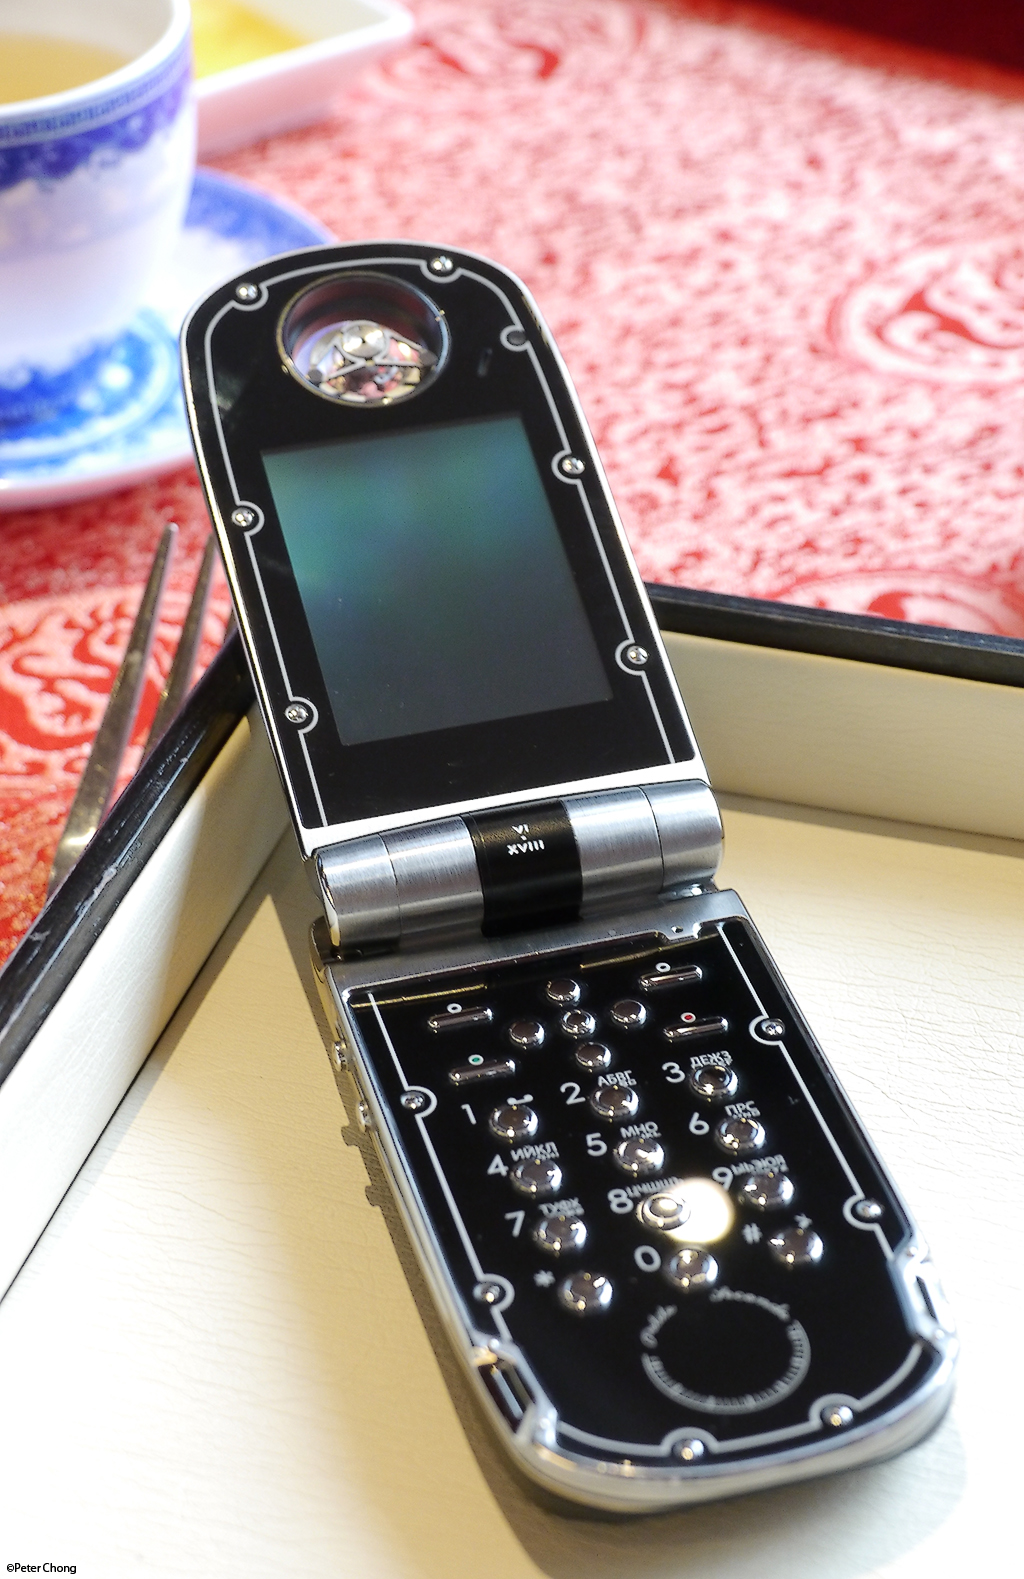 celsius x vi ii papillon tourbillon mobile phone. Black Bedroom Furniture Sets. Home Design Ideas